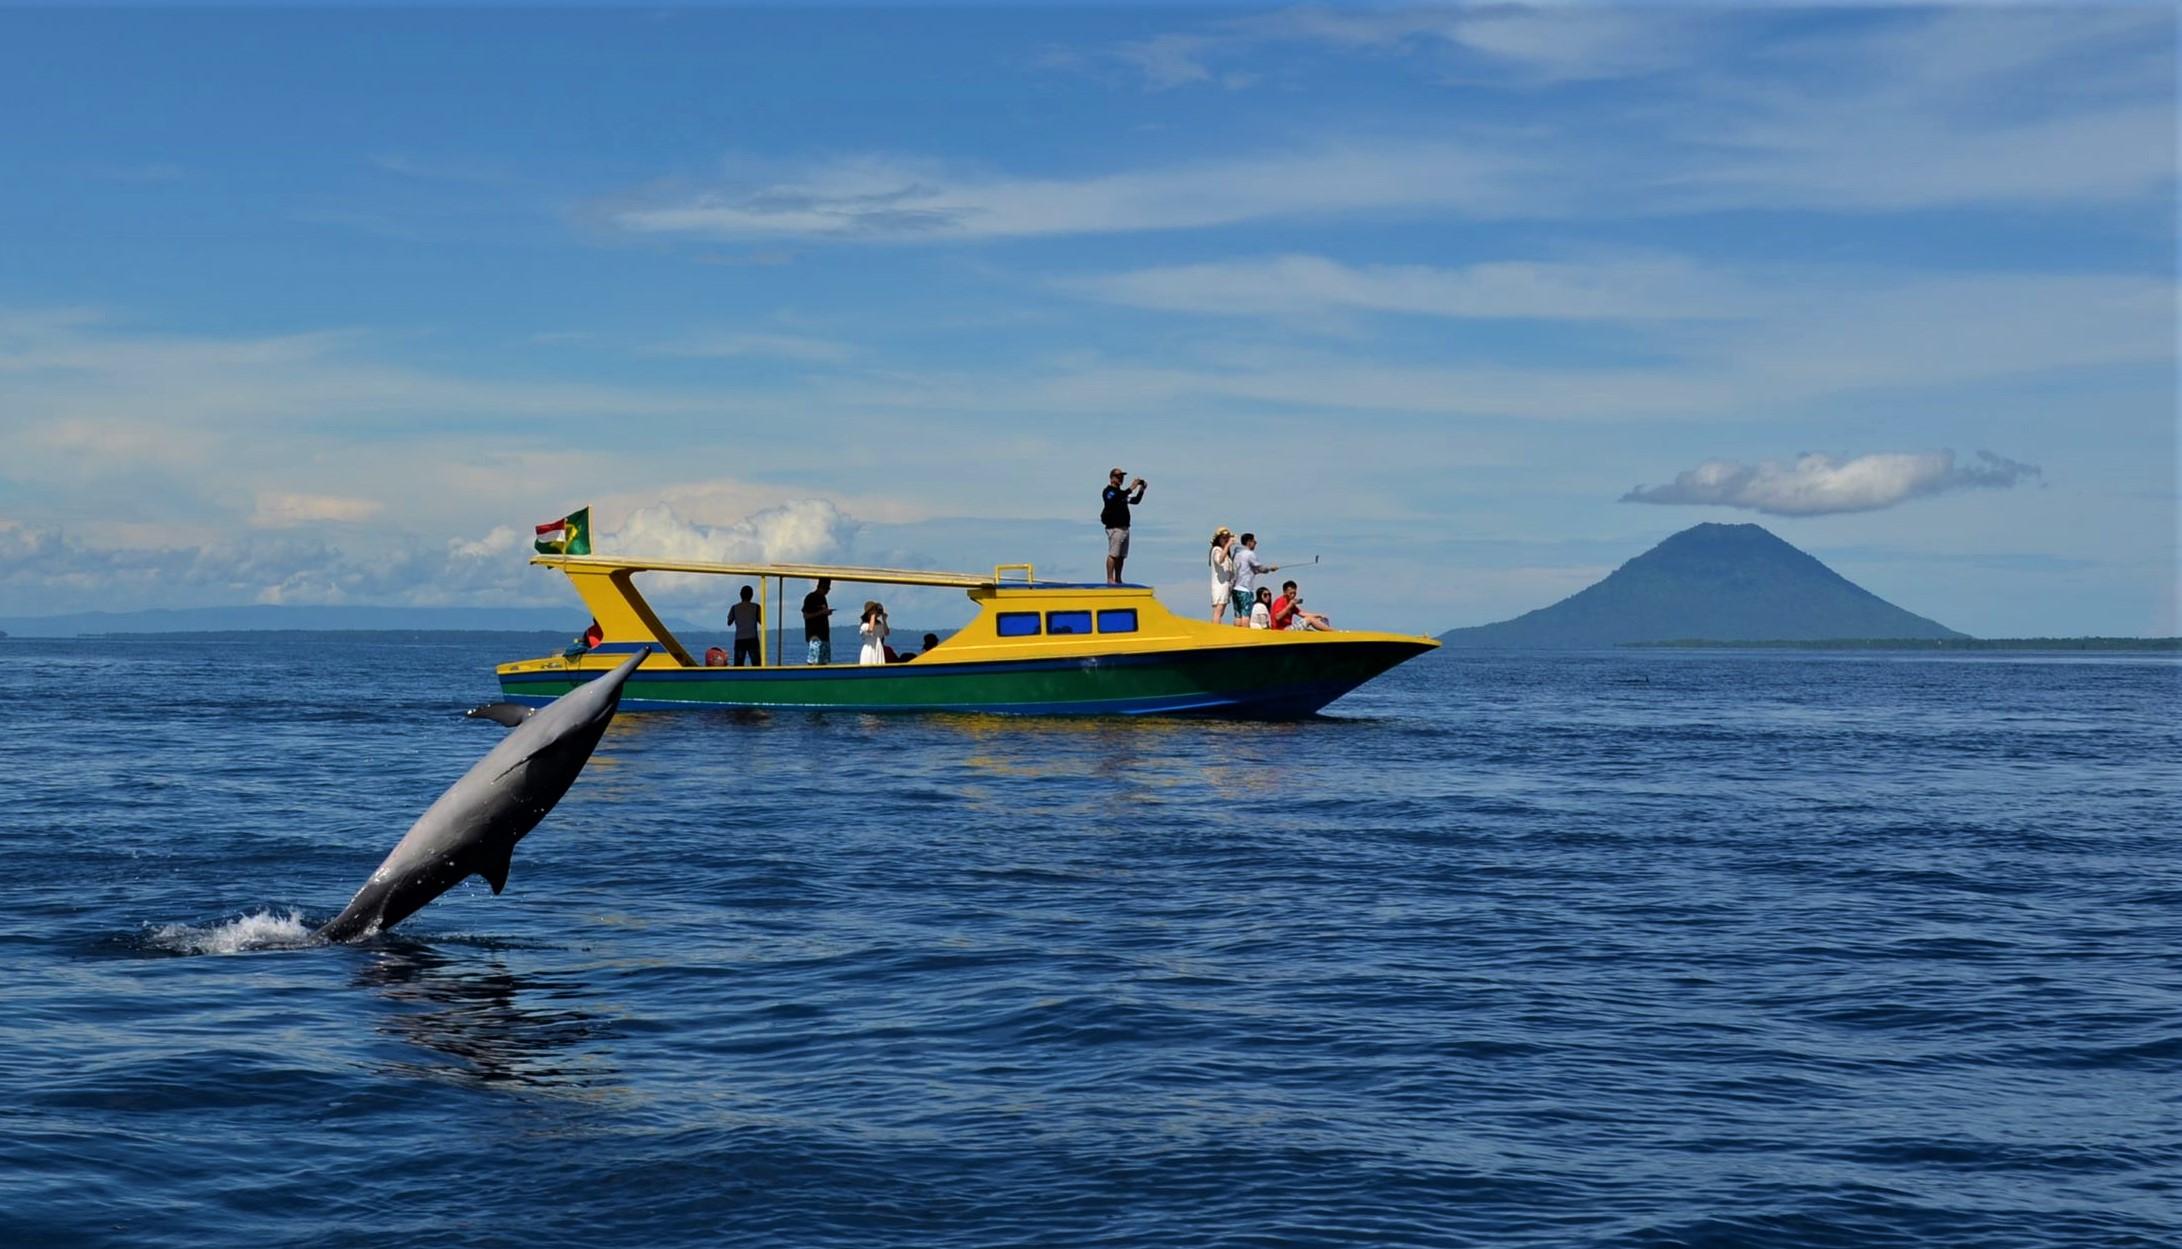 Ini dia 6 jenis raksasa laut yang selalu bermain di Teluk Manado